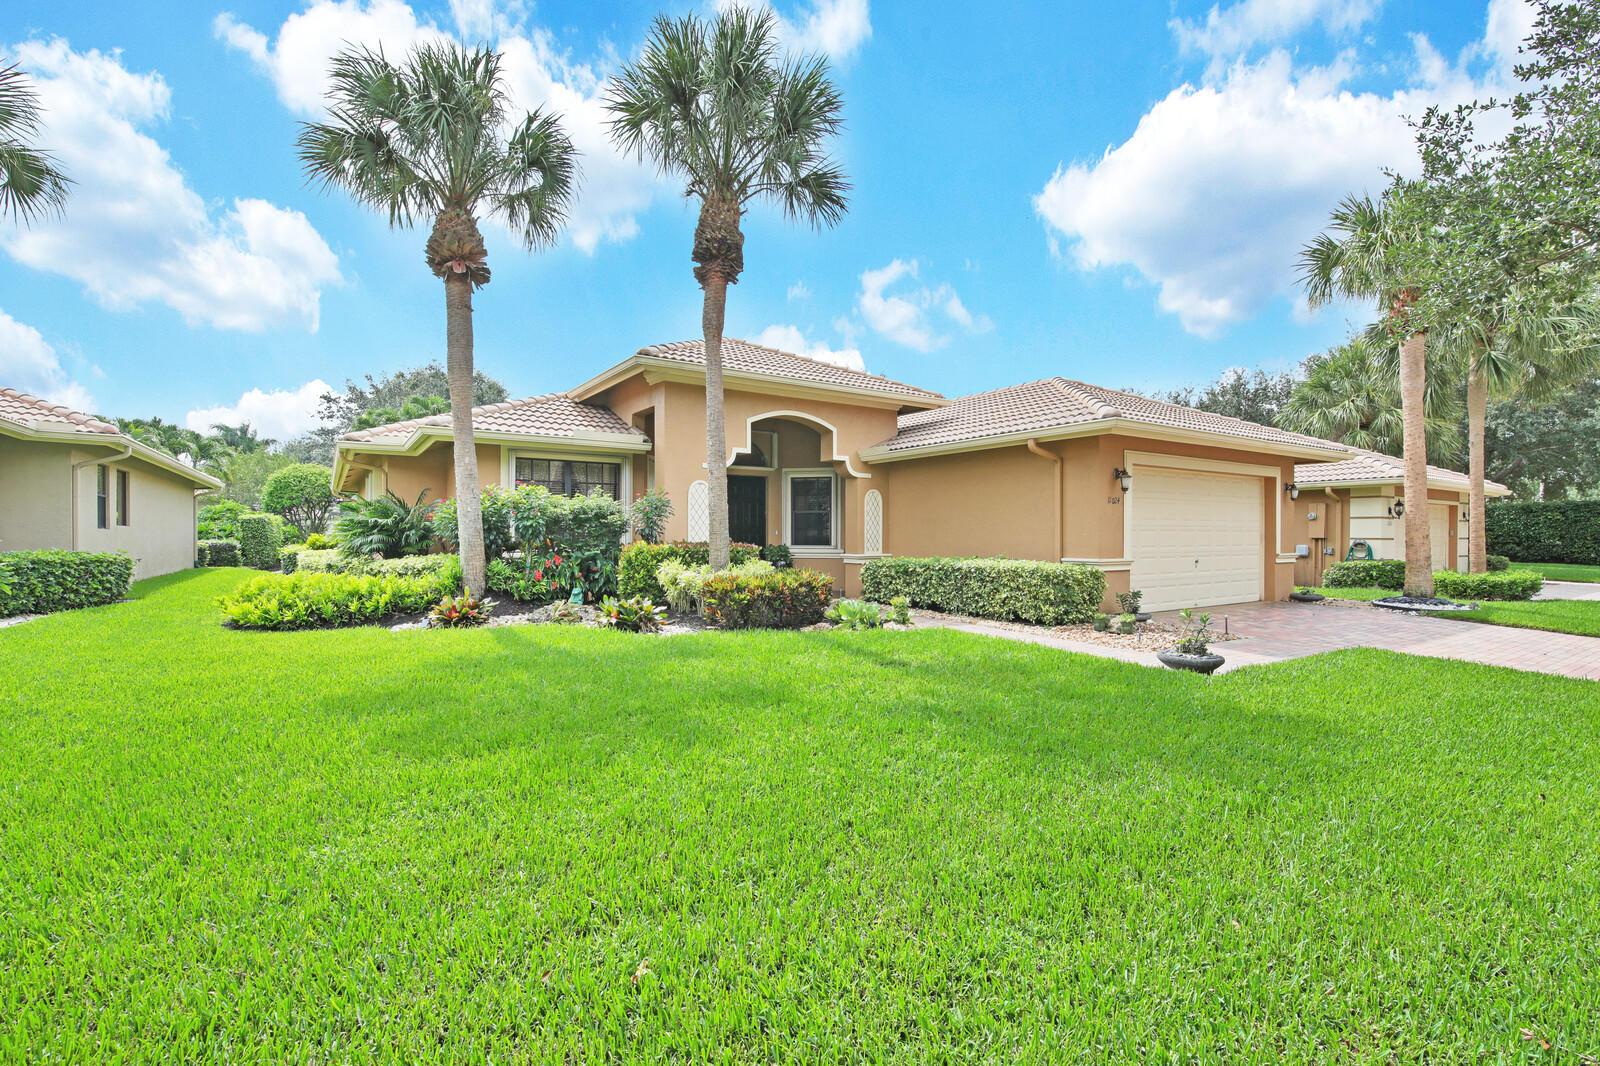 Photo of 11024 Via Sorrento, Boynton Beach, FL 33437